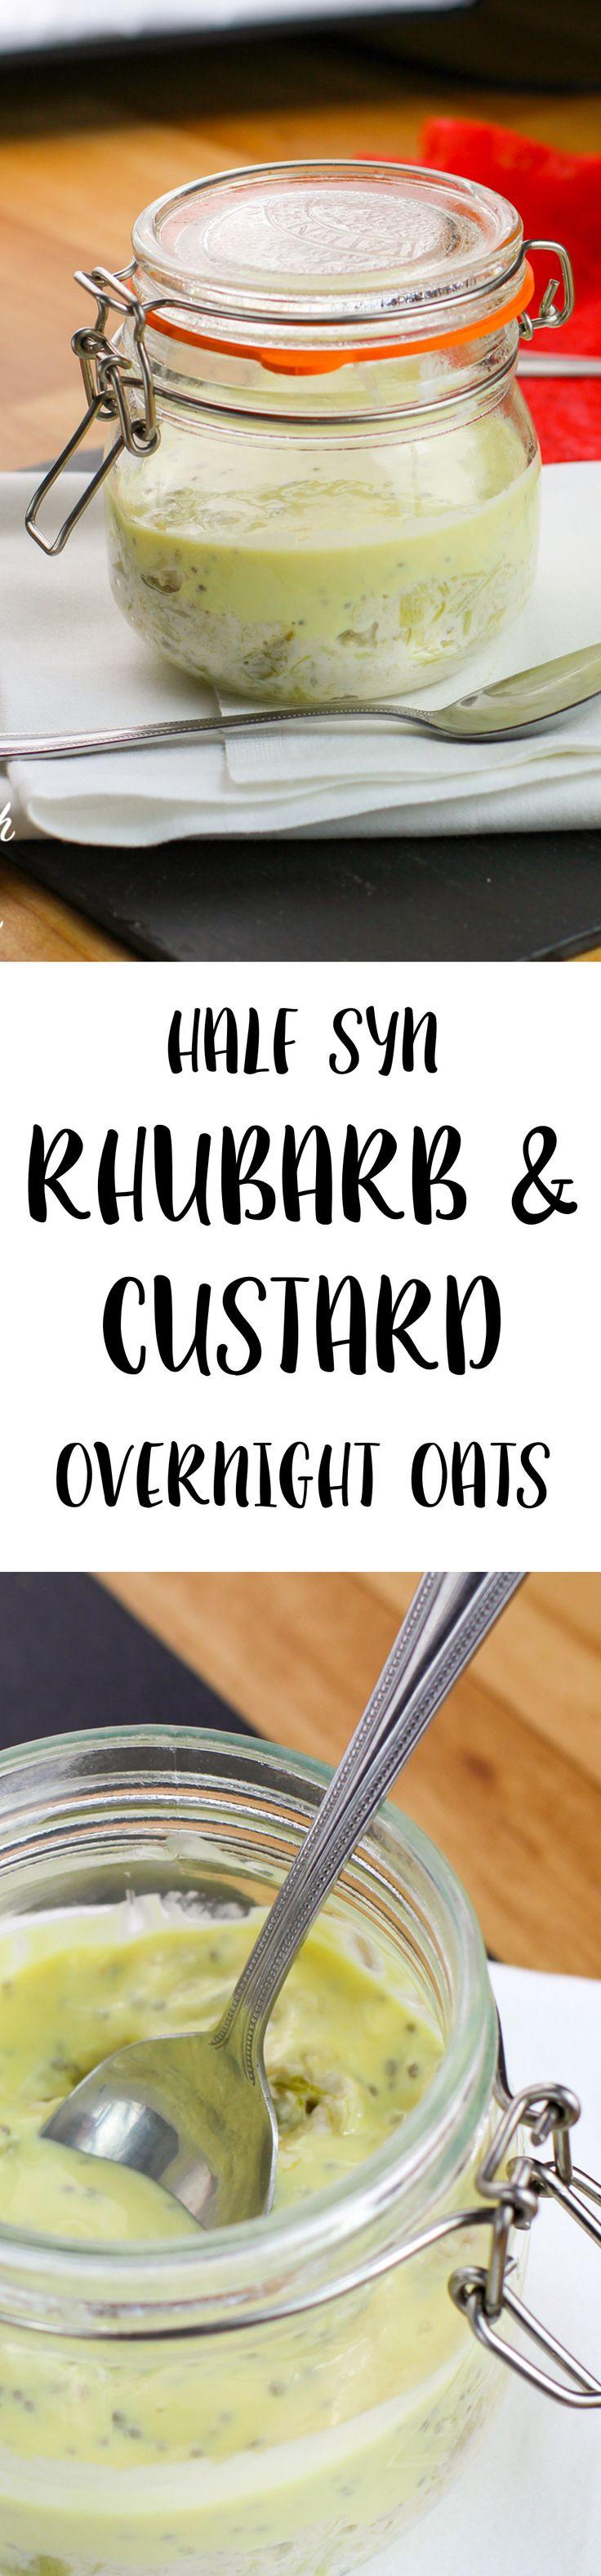 0.5 Syn Rhubarb & Custard Overnight Oats | Slimming World